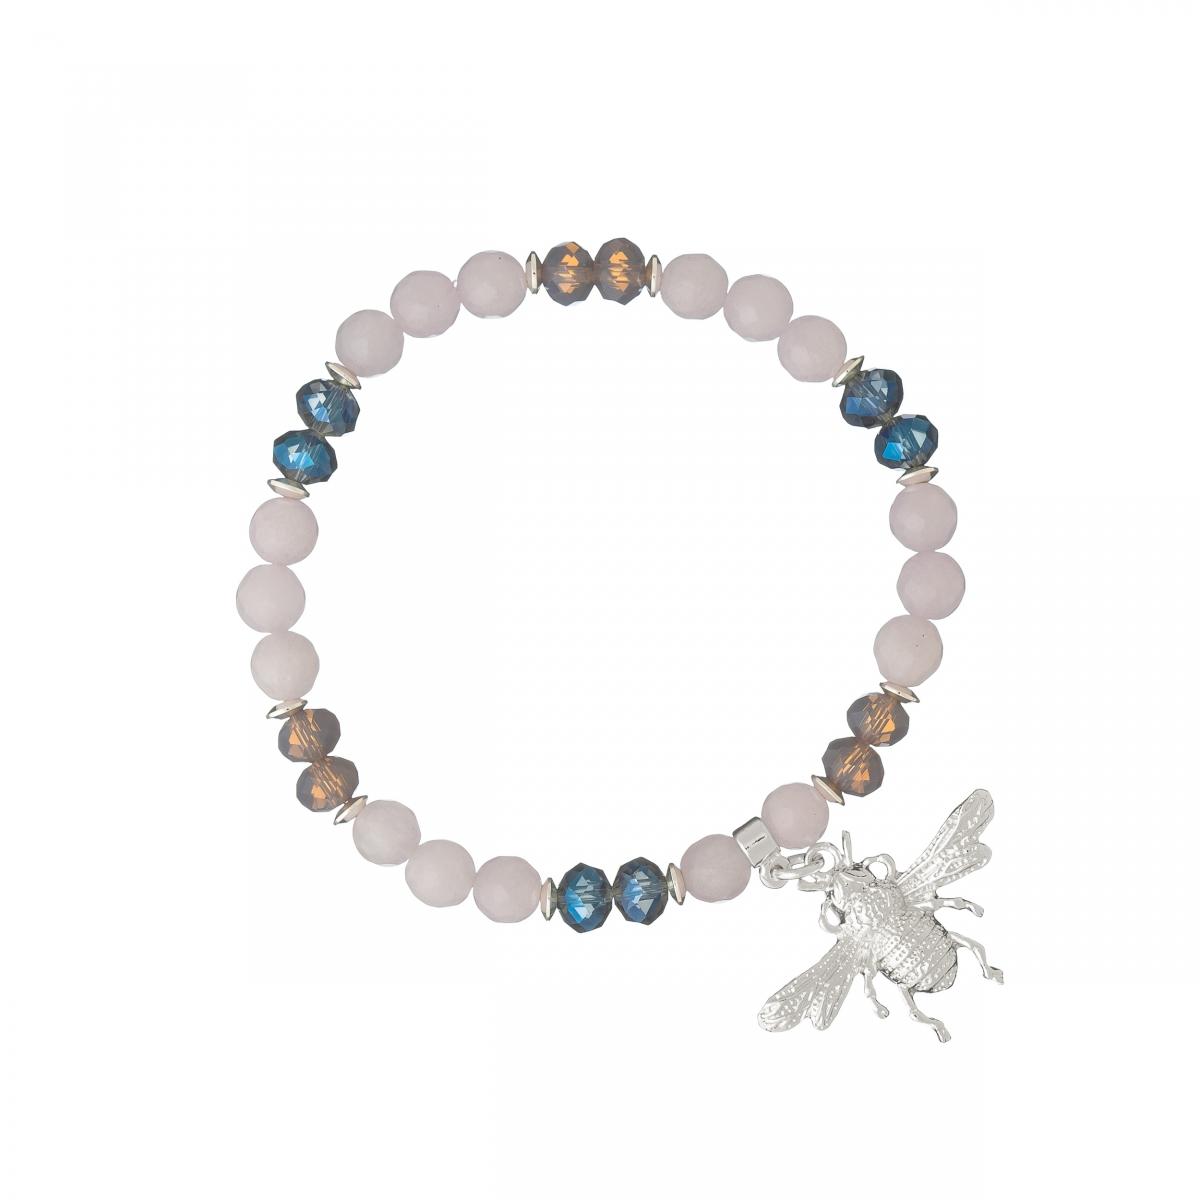 Náramok Mineral Jadeit Violet Silver Fly